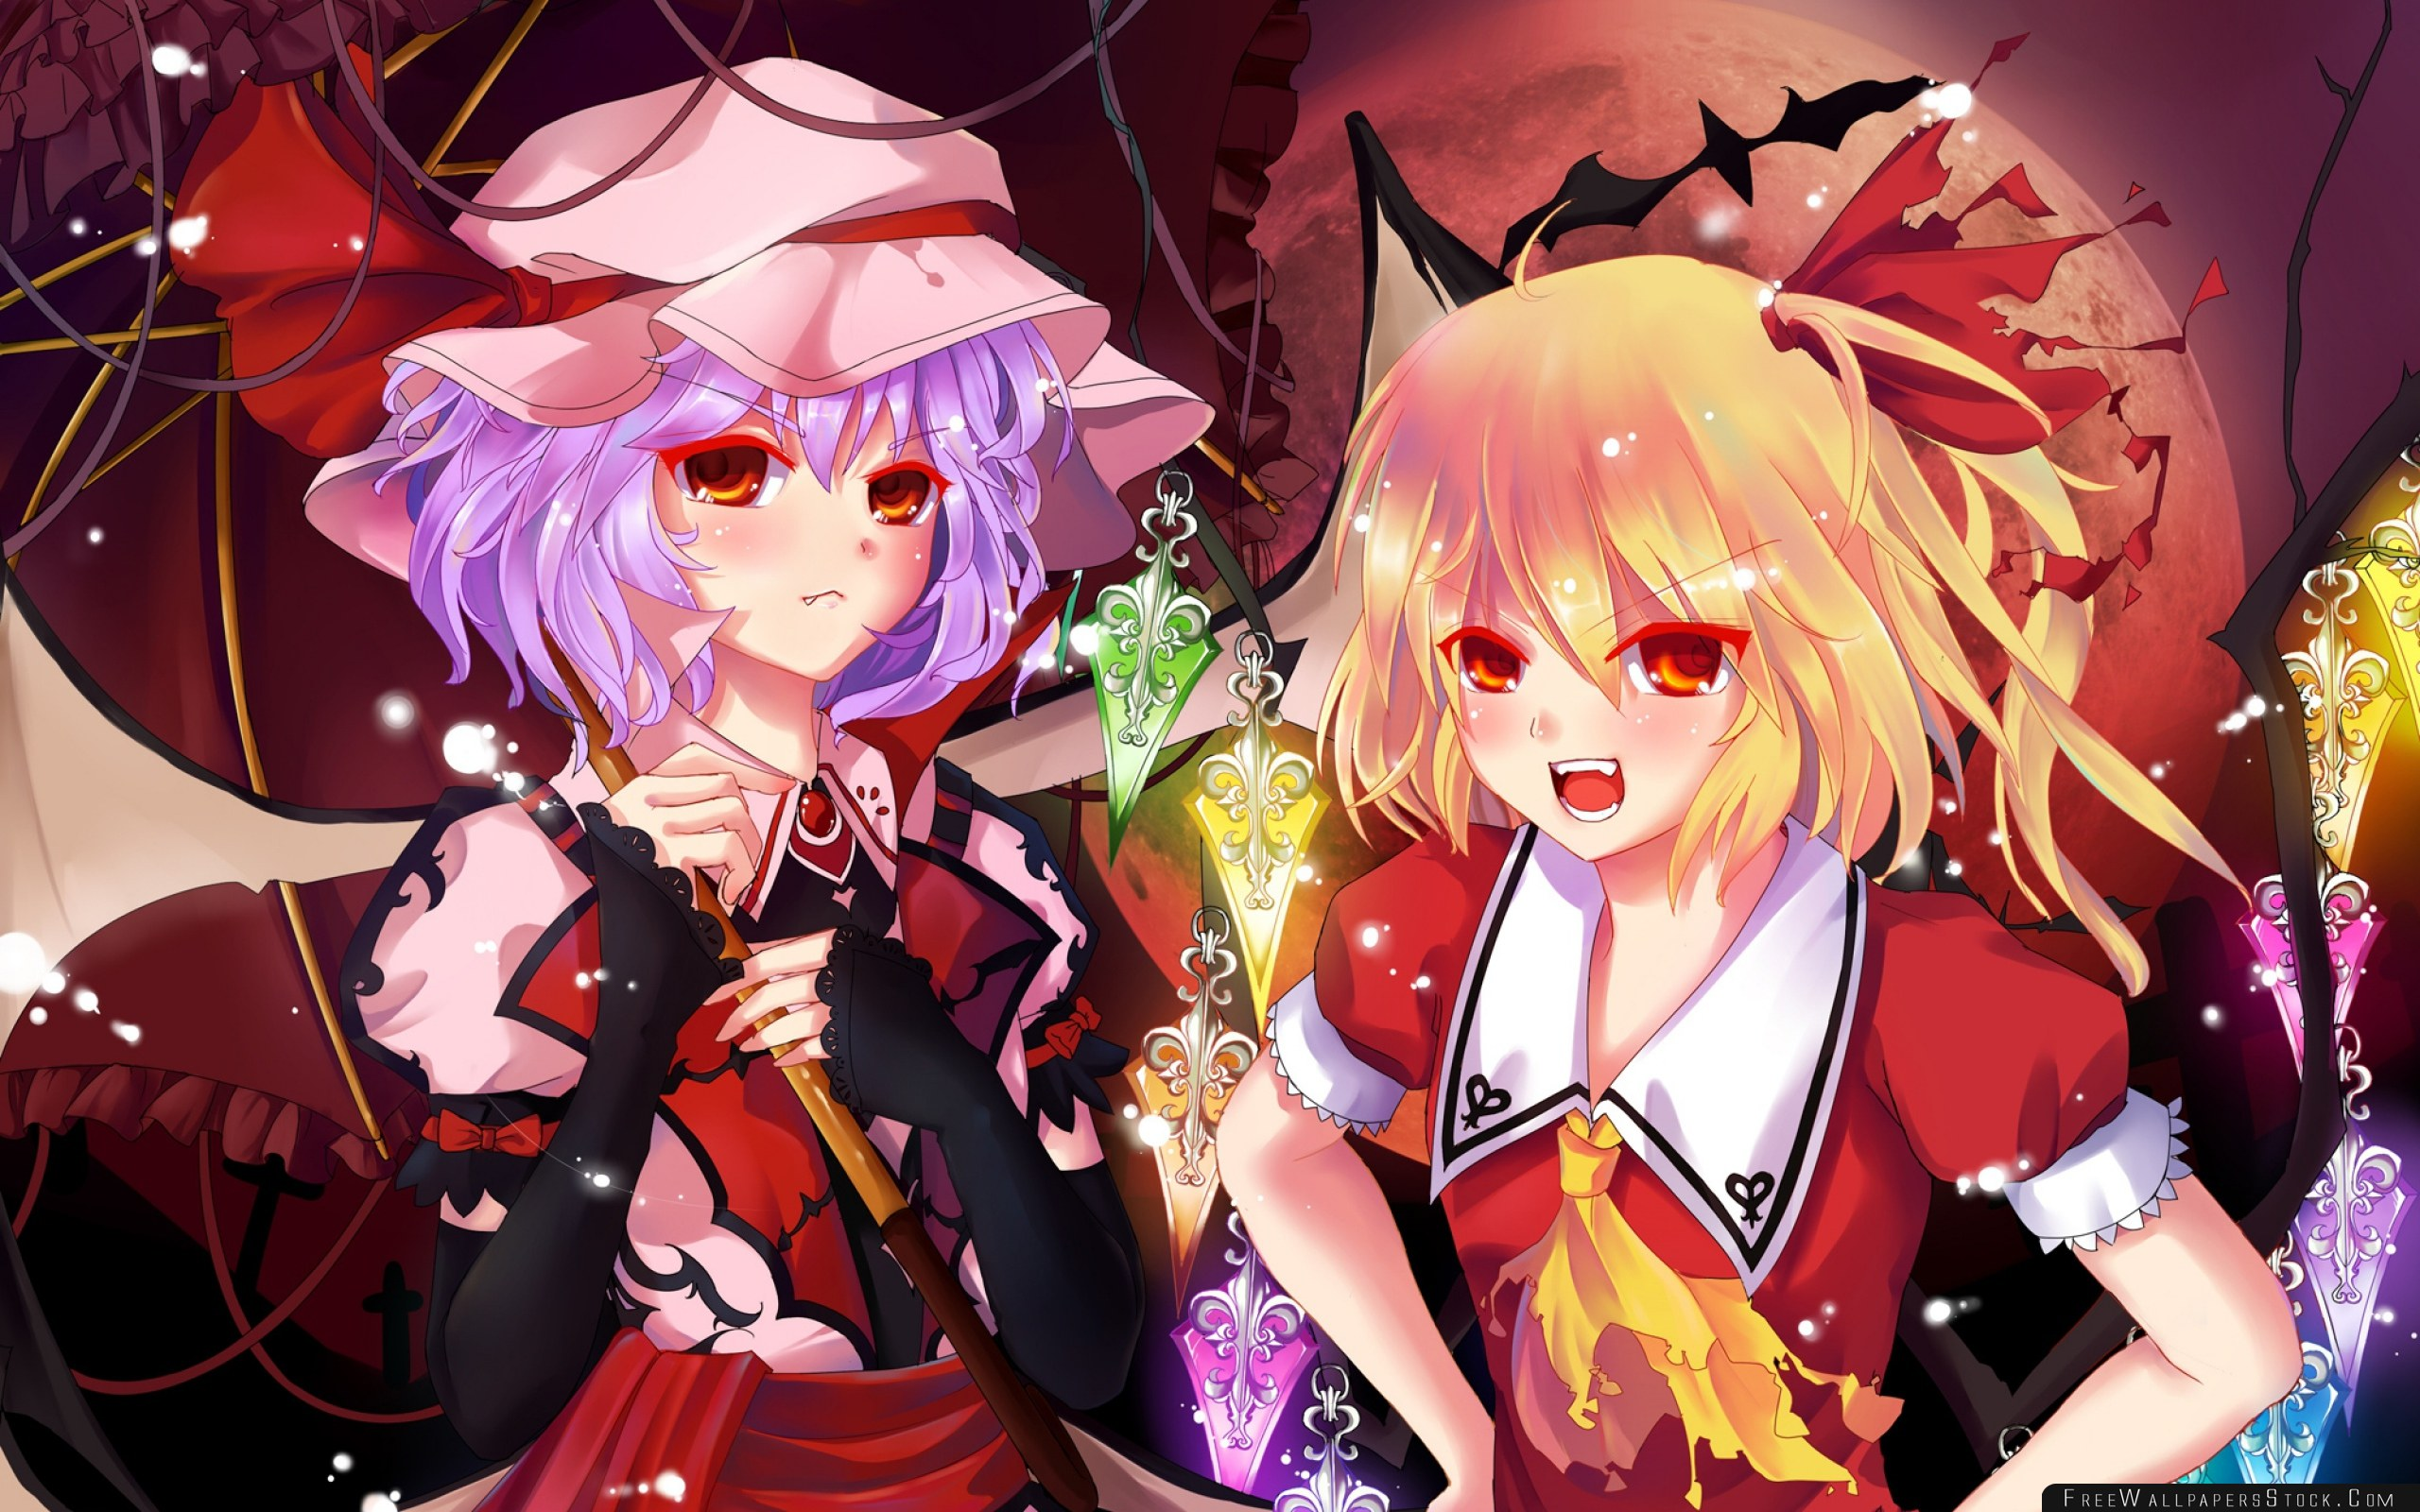 Download Free Wallpaper Anime Girls Creatures Night Moon